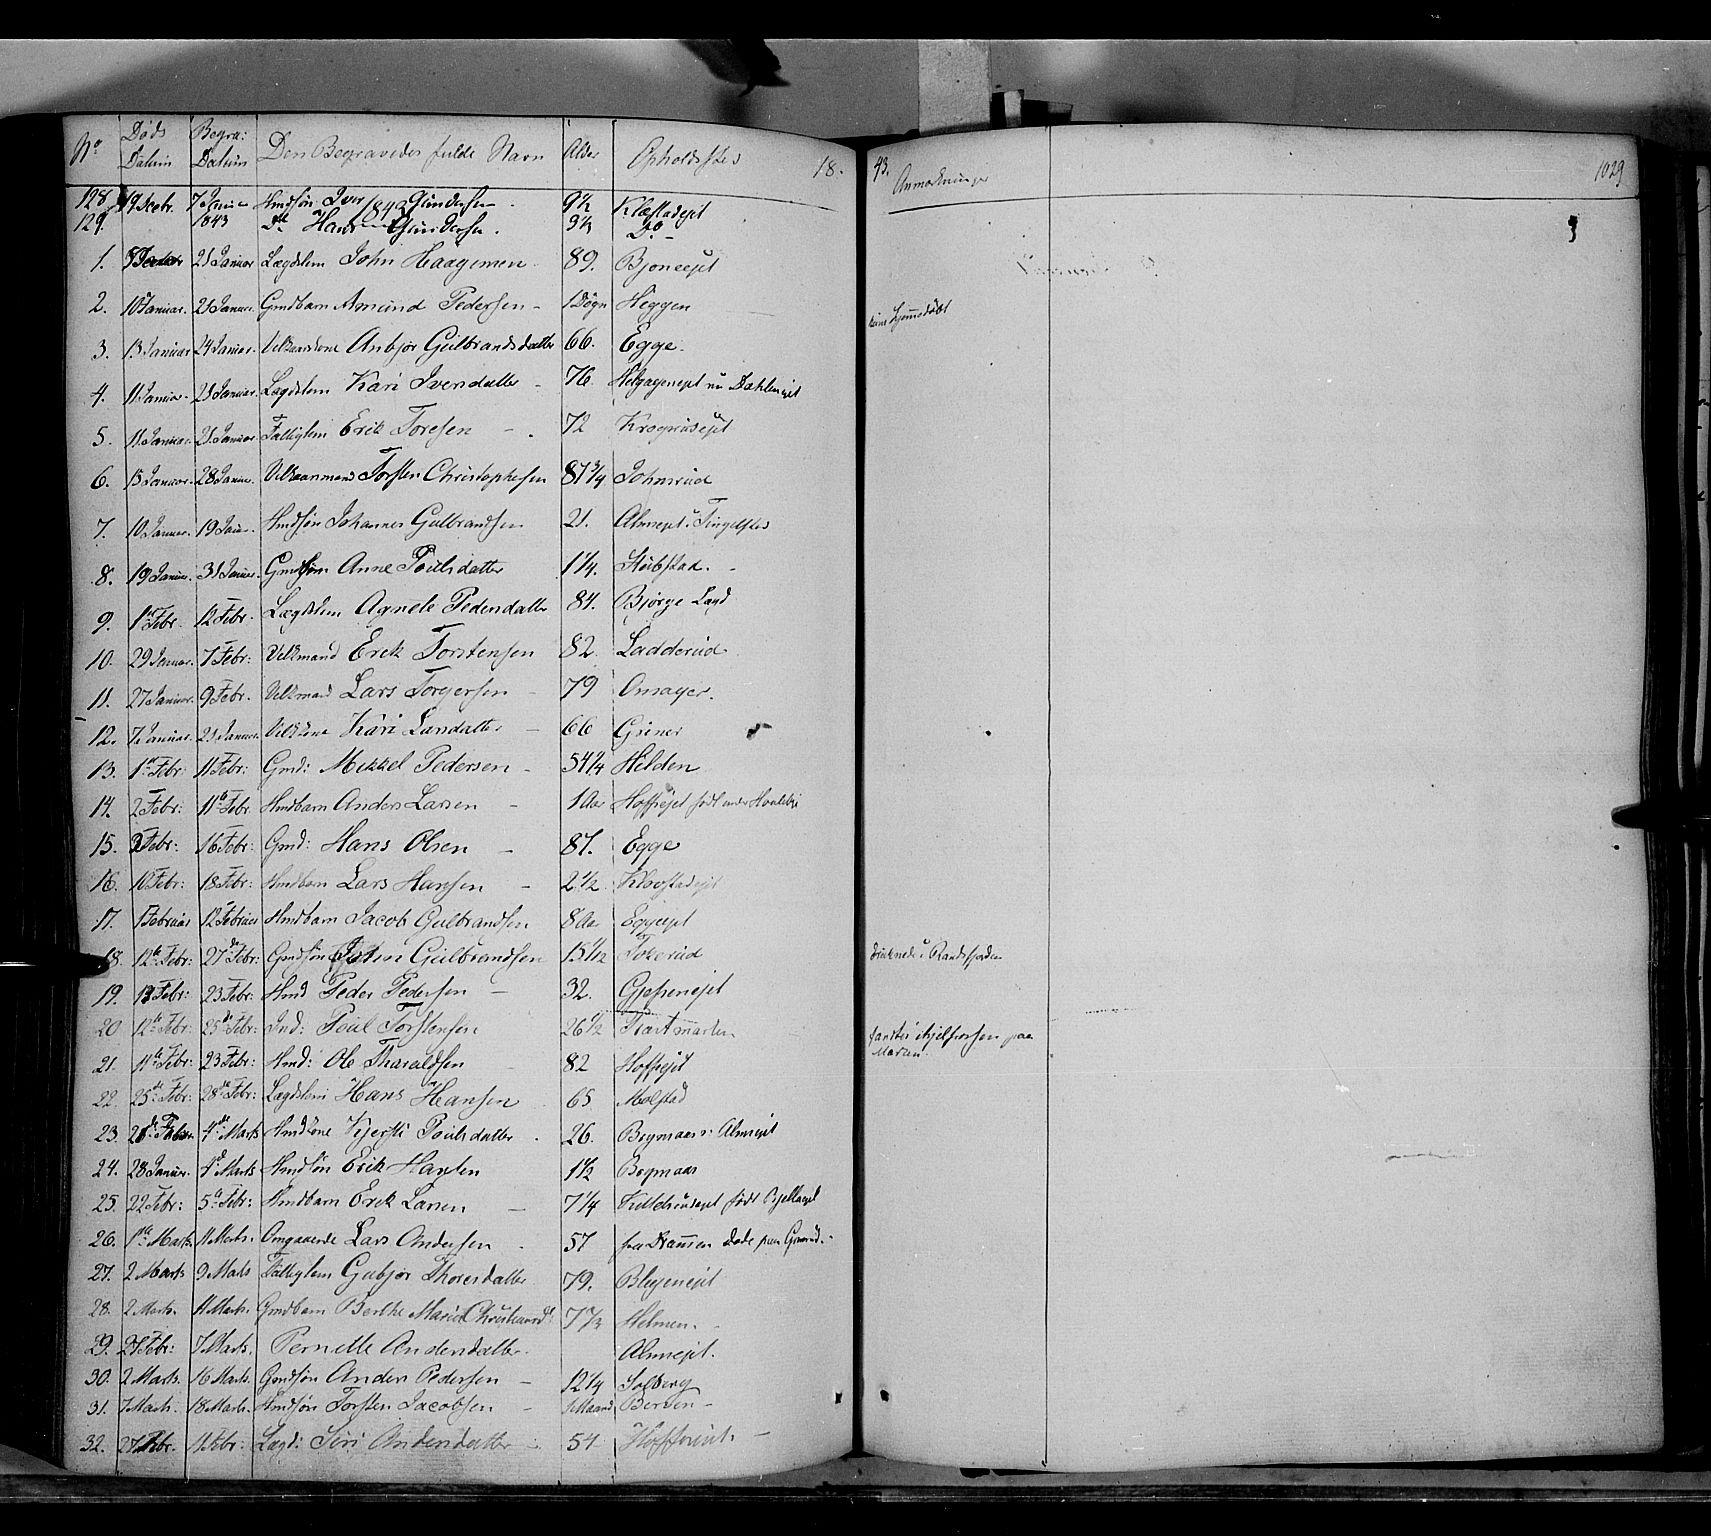 SAH, Gran prestekontor, Ministerialbok nr. 11, 1842-1856, s. 1028-1029